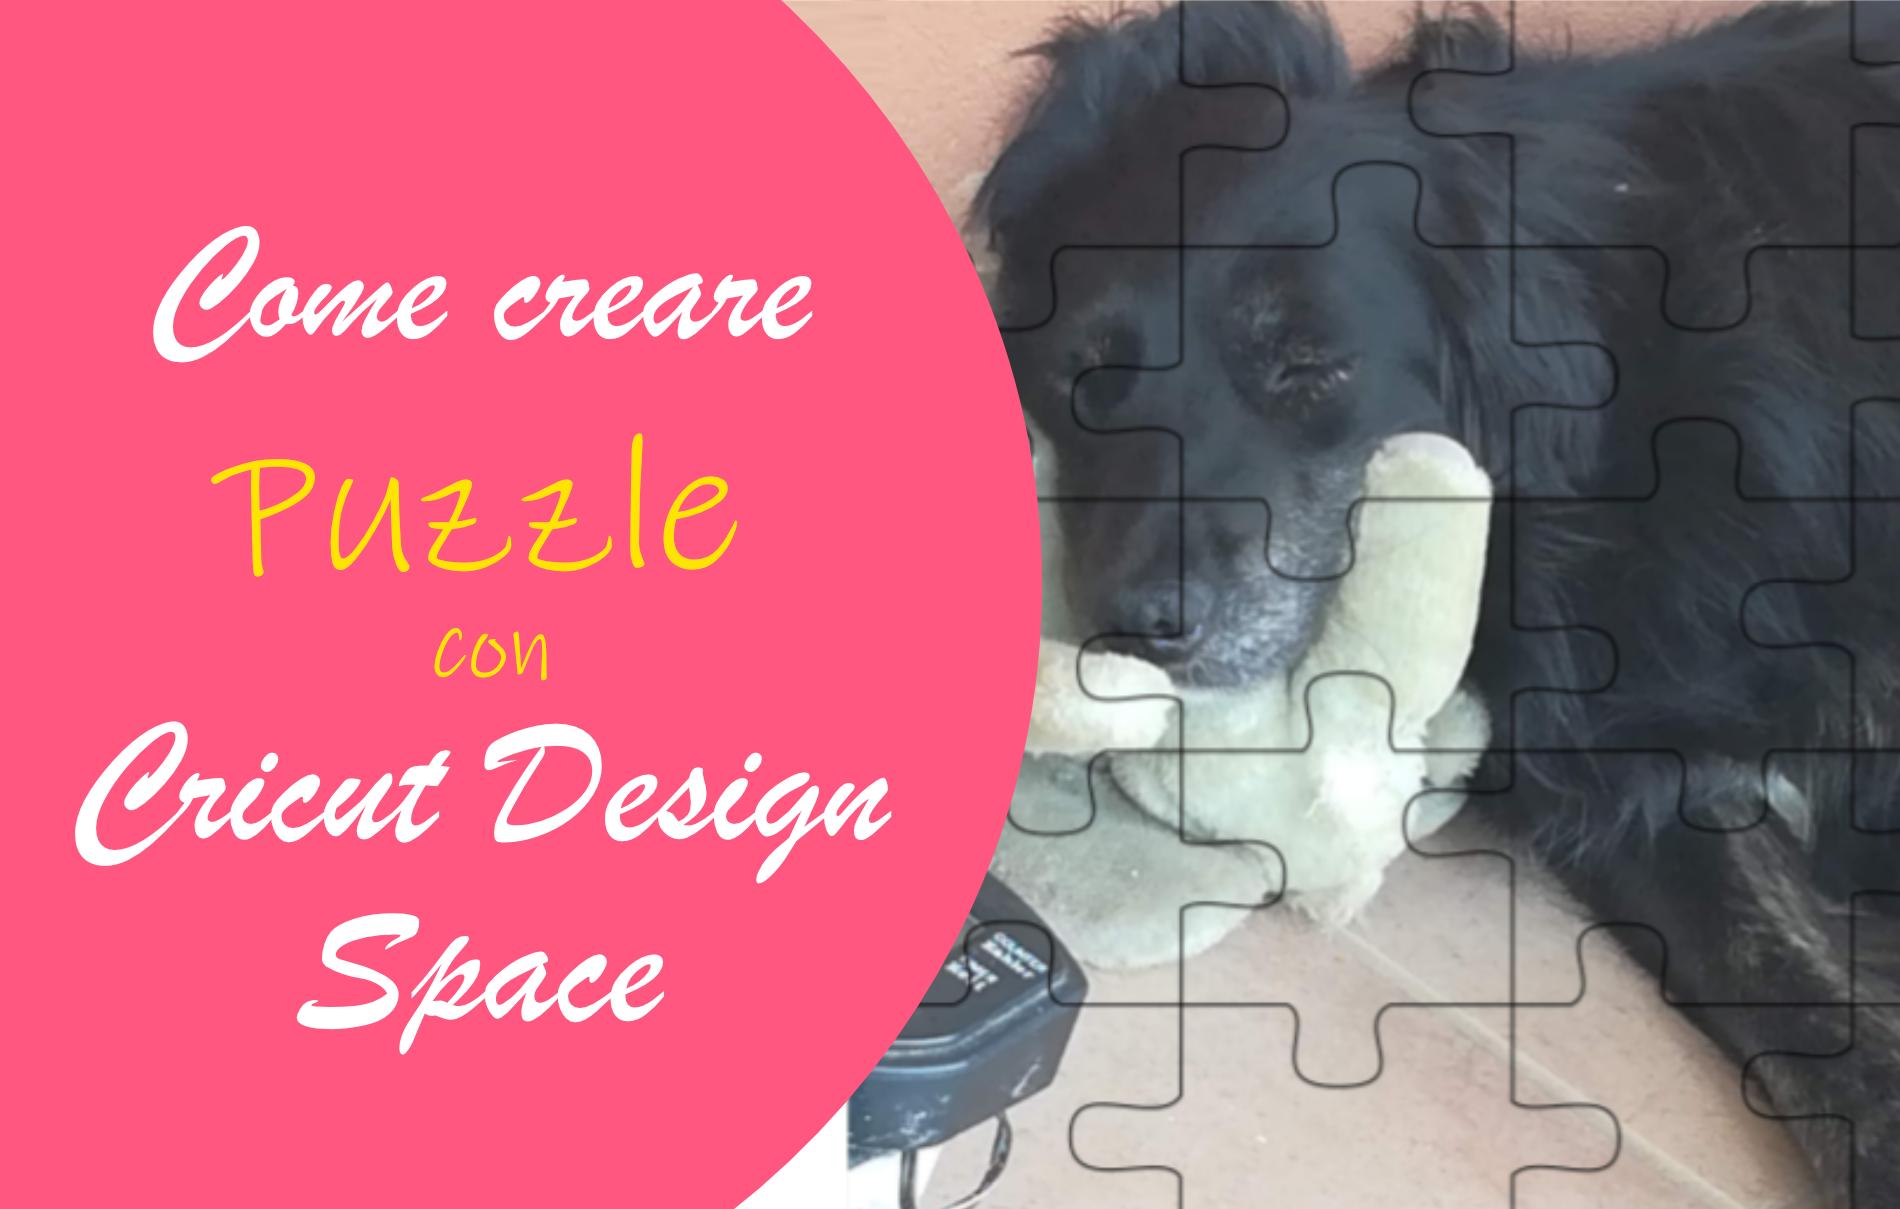 Puzzle Cricut Desgin Space Cricut Maker